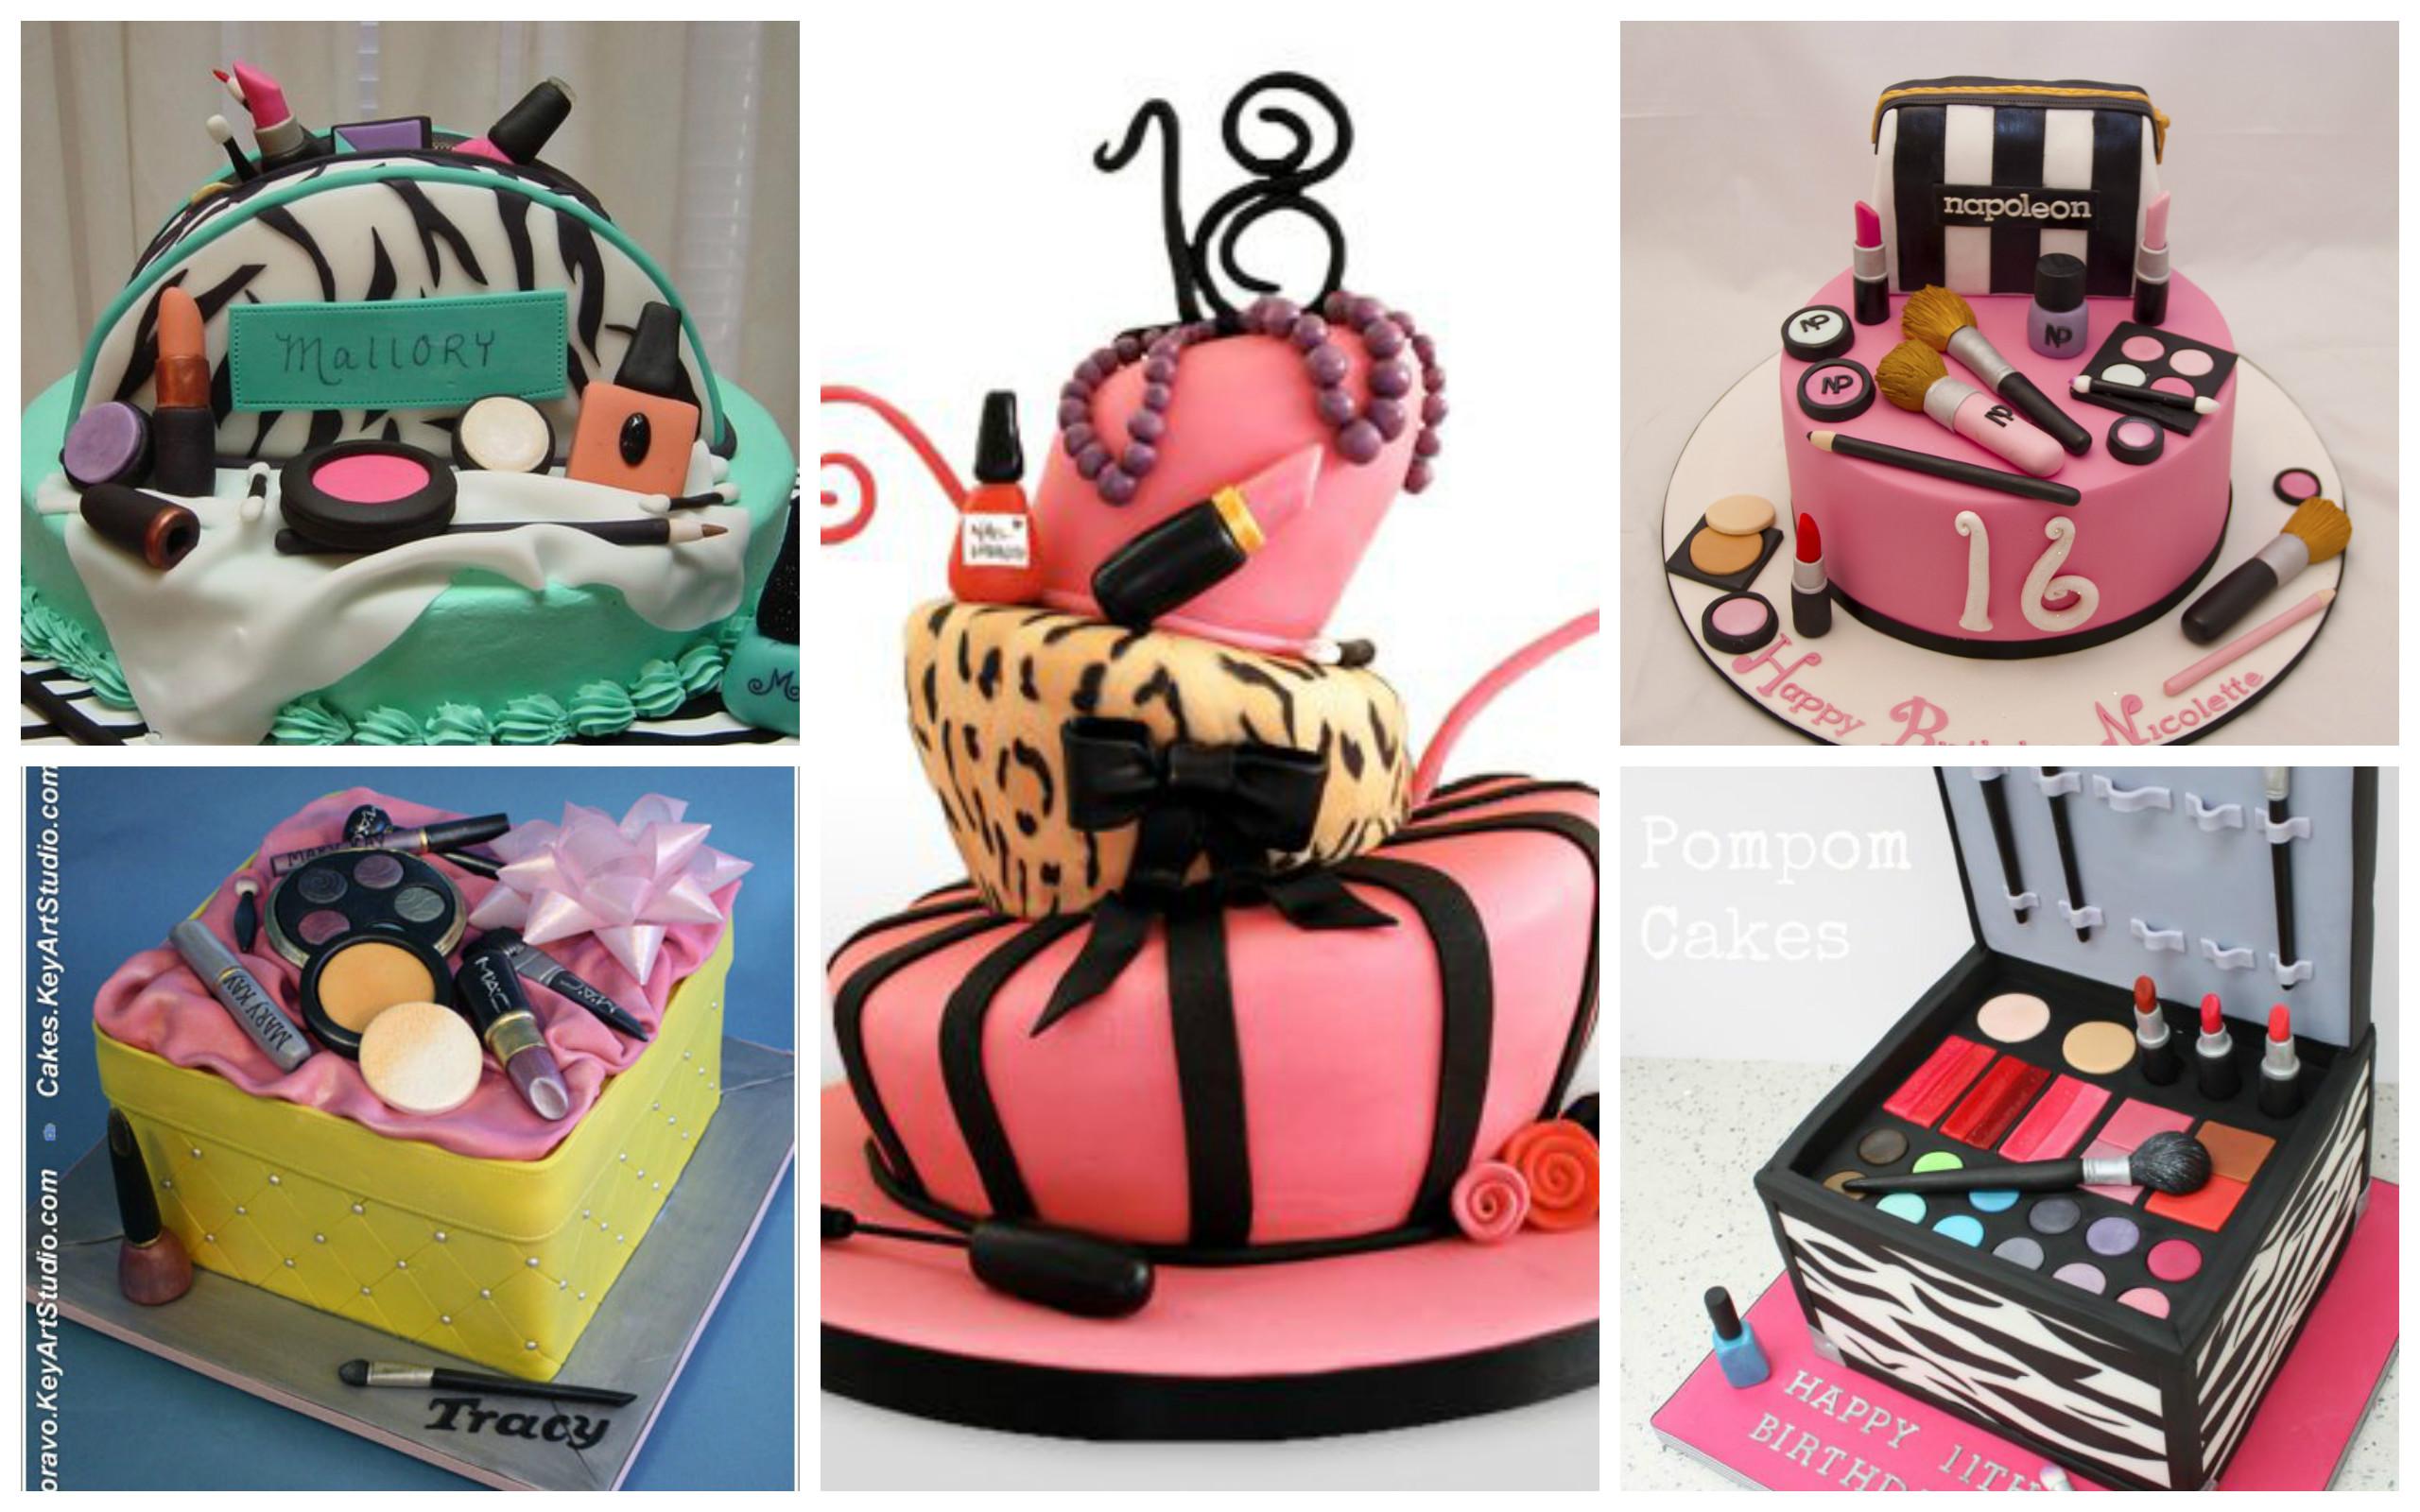 Makeup Cake Decorations : Amazing Makeup Cake Ideas - Page 5 of 21